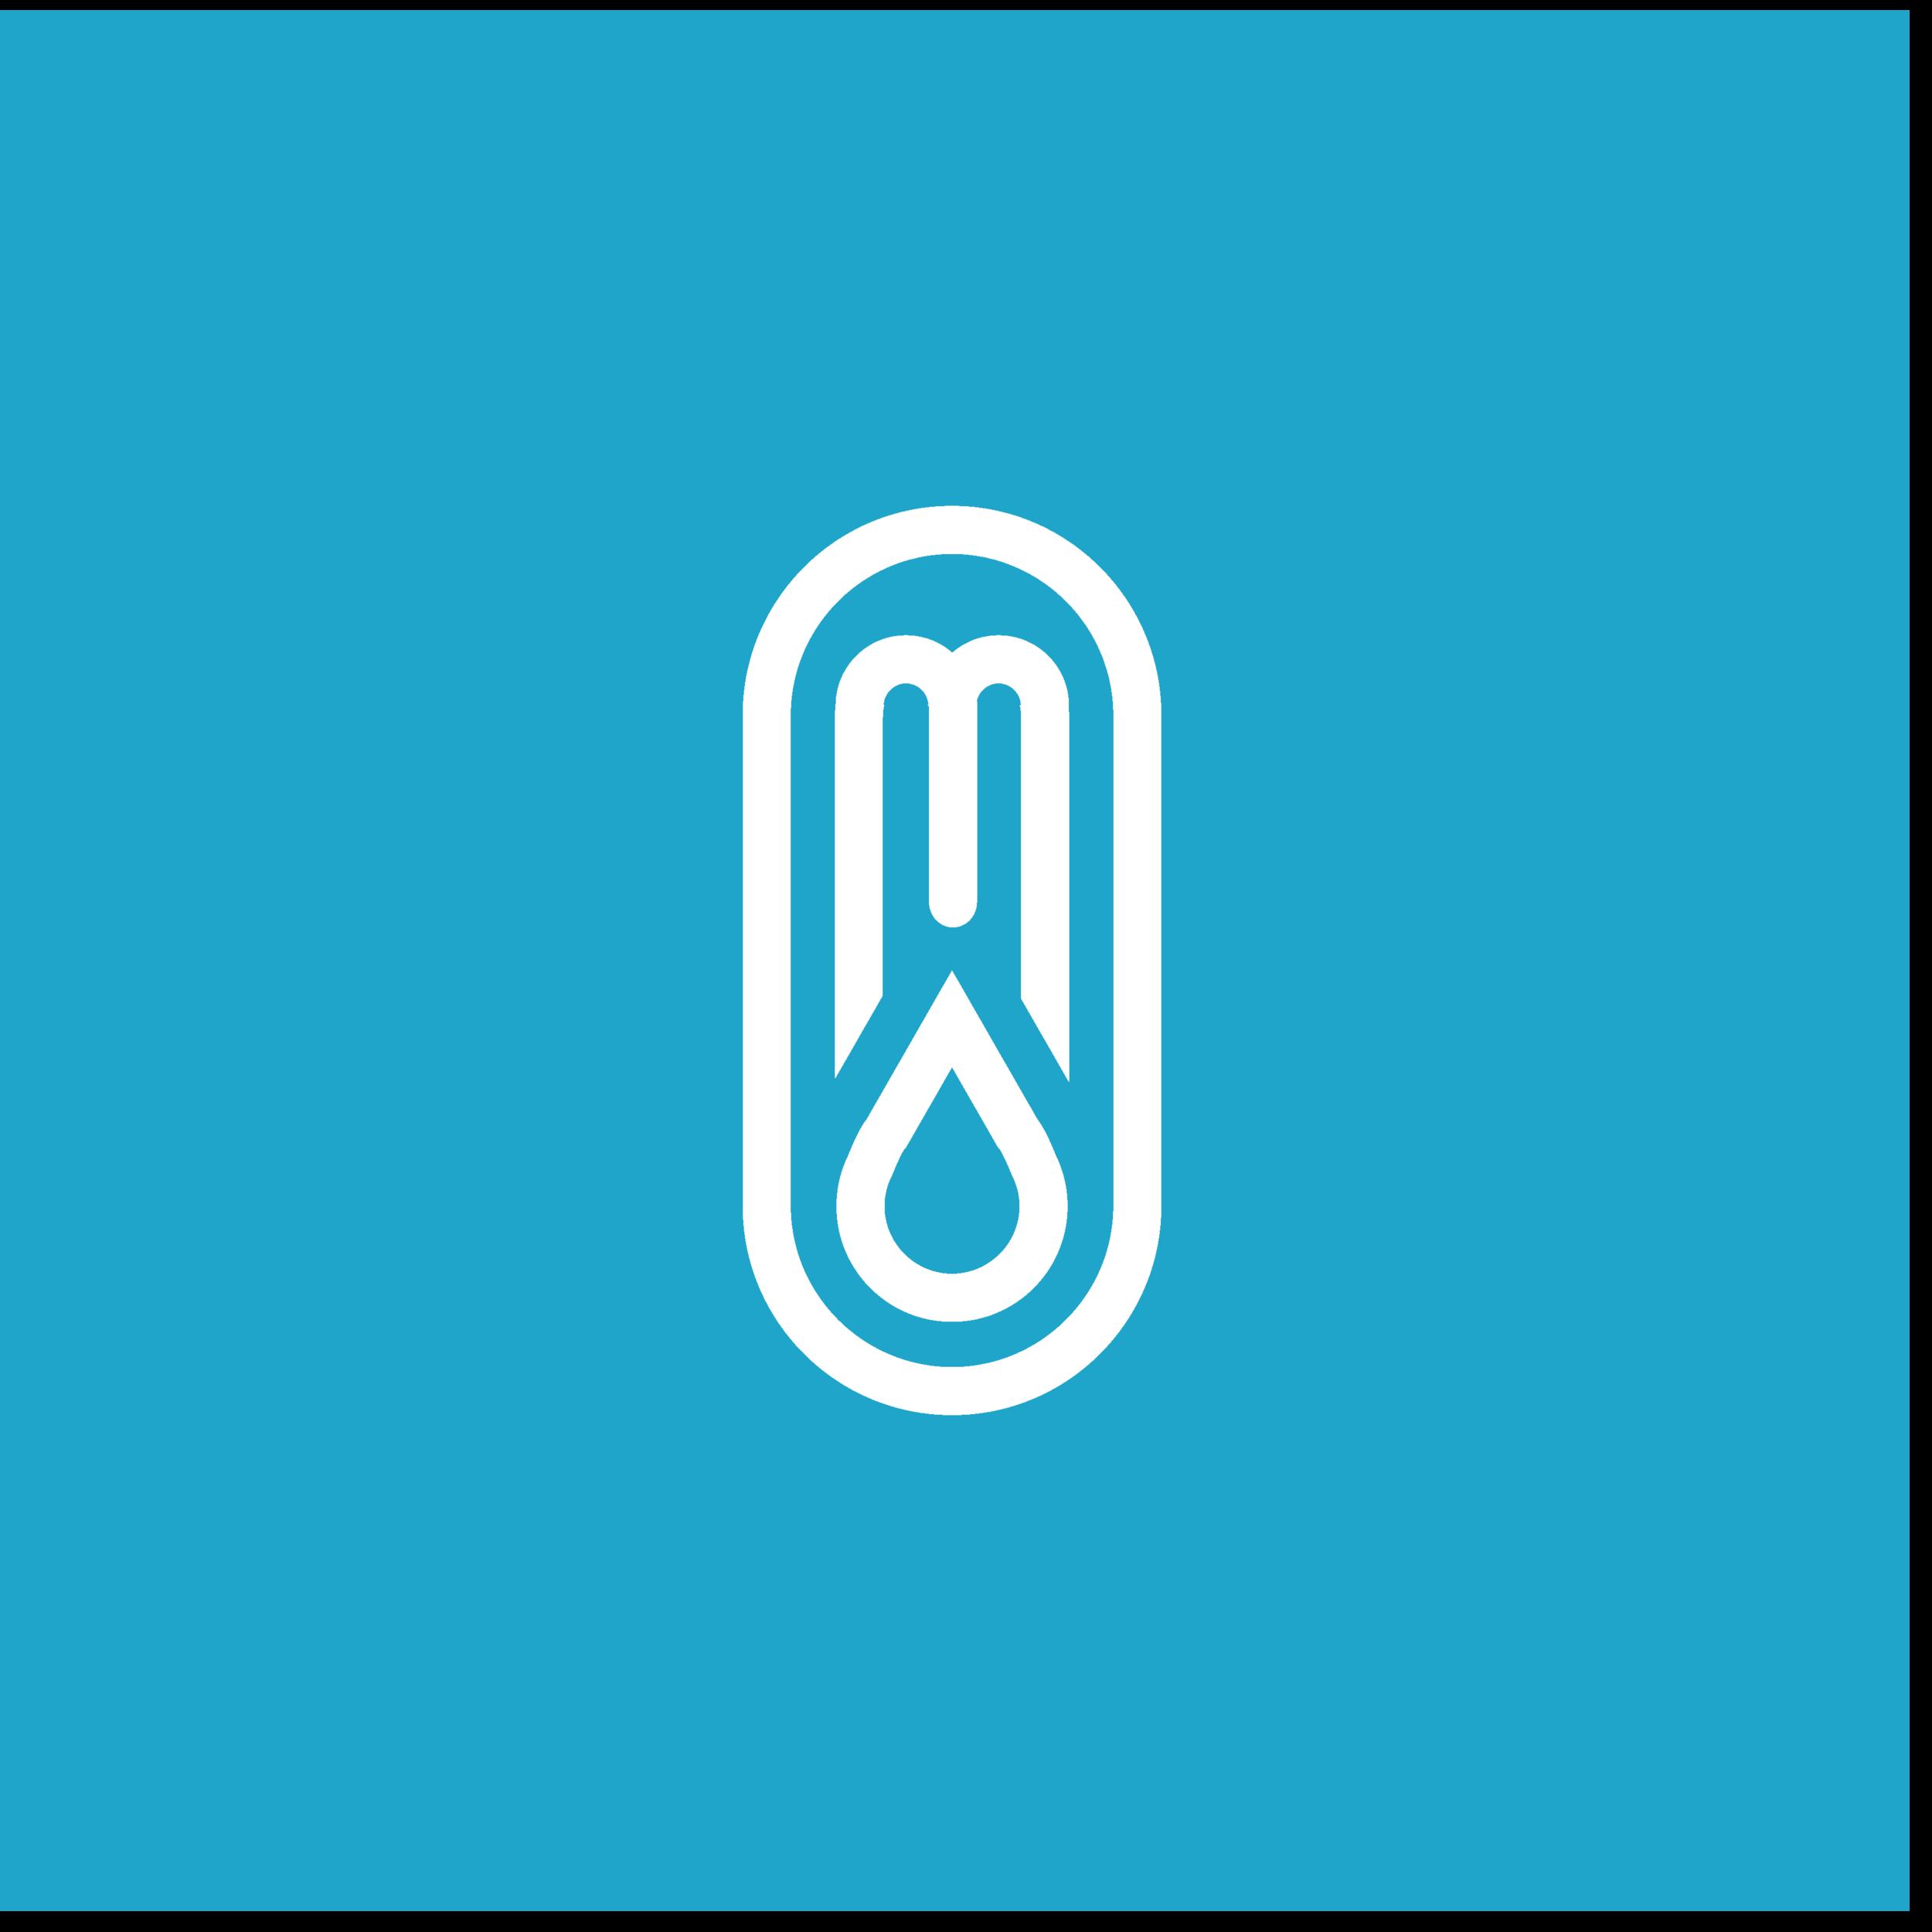 Branding Portfolio Files for Web-15.png